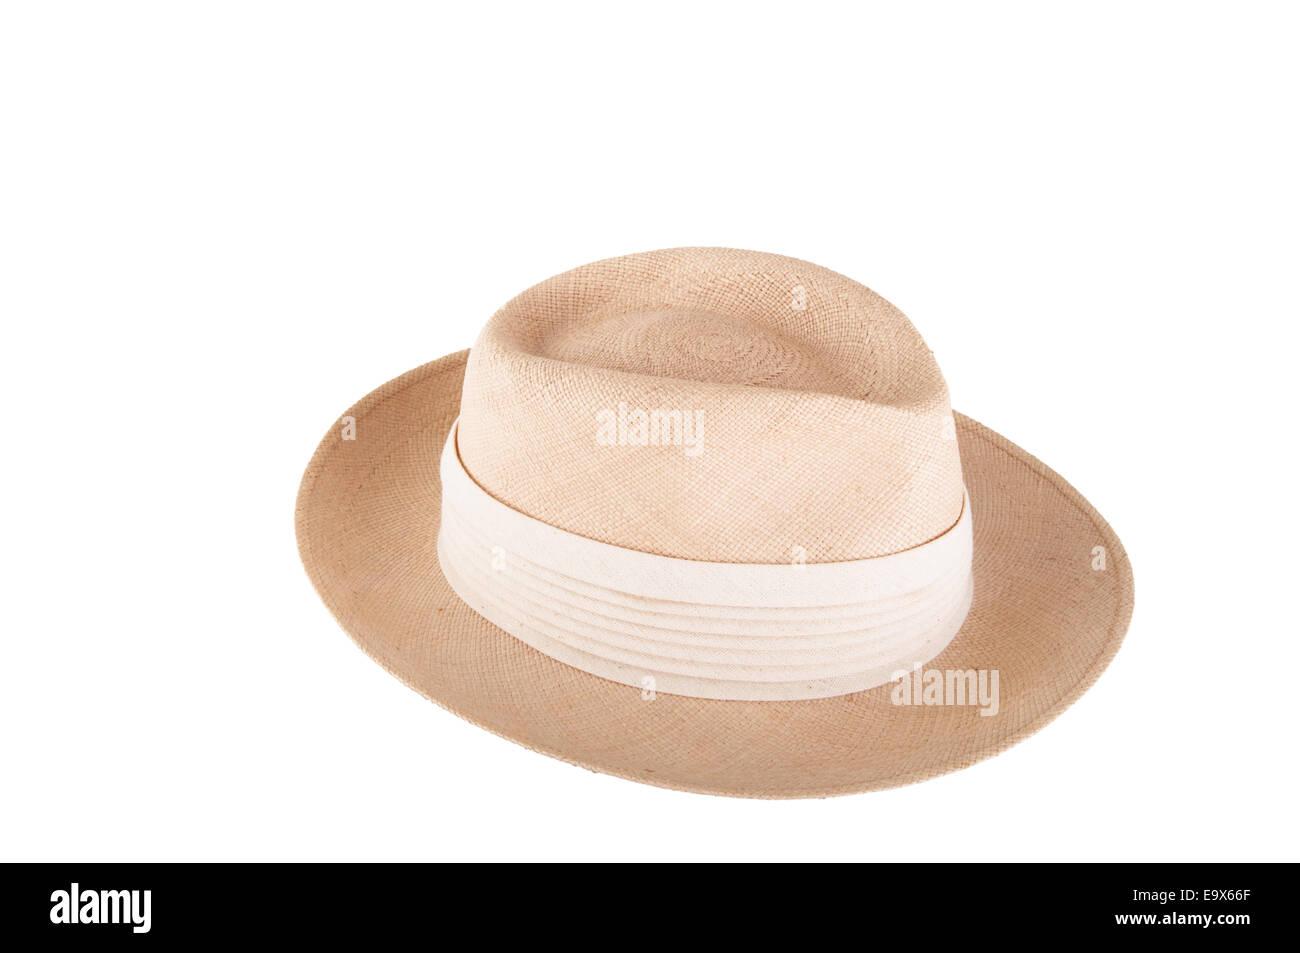 Panama hat - isolated over white - Stock Image